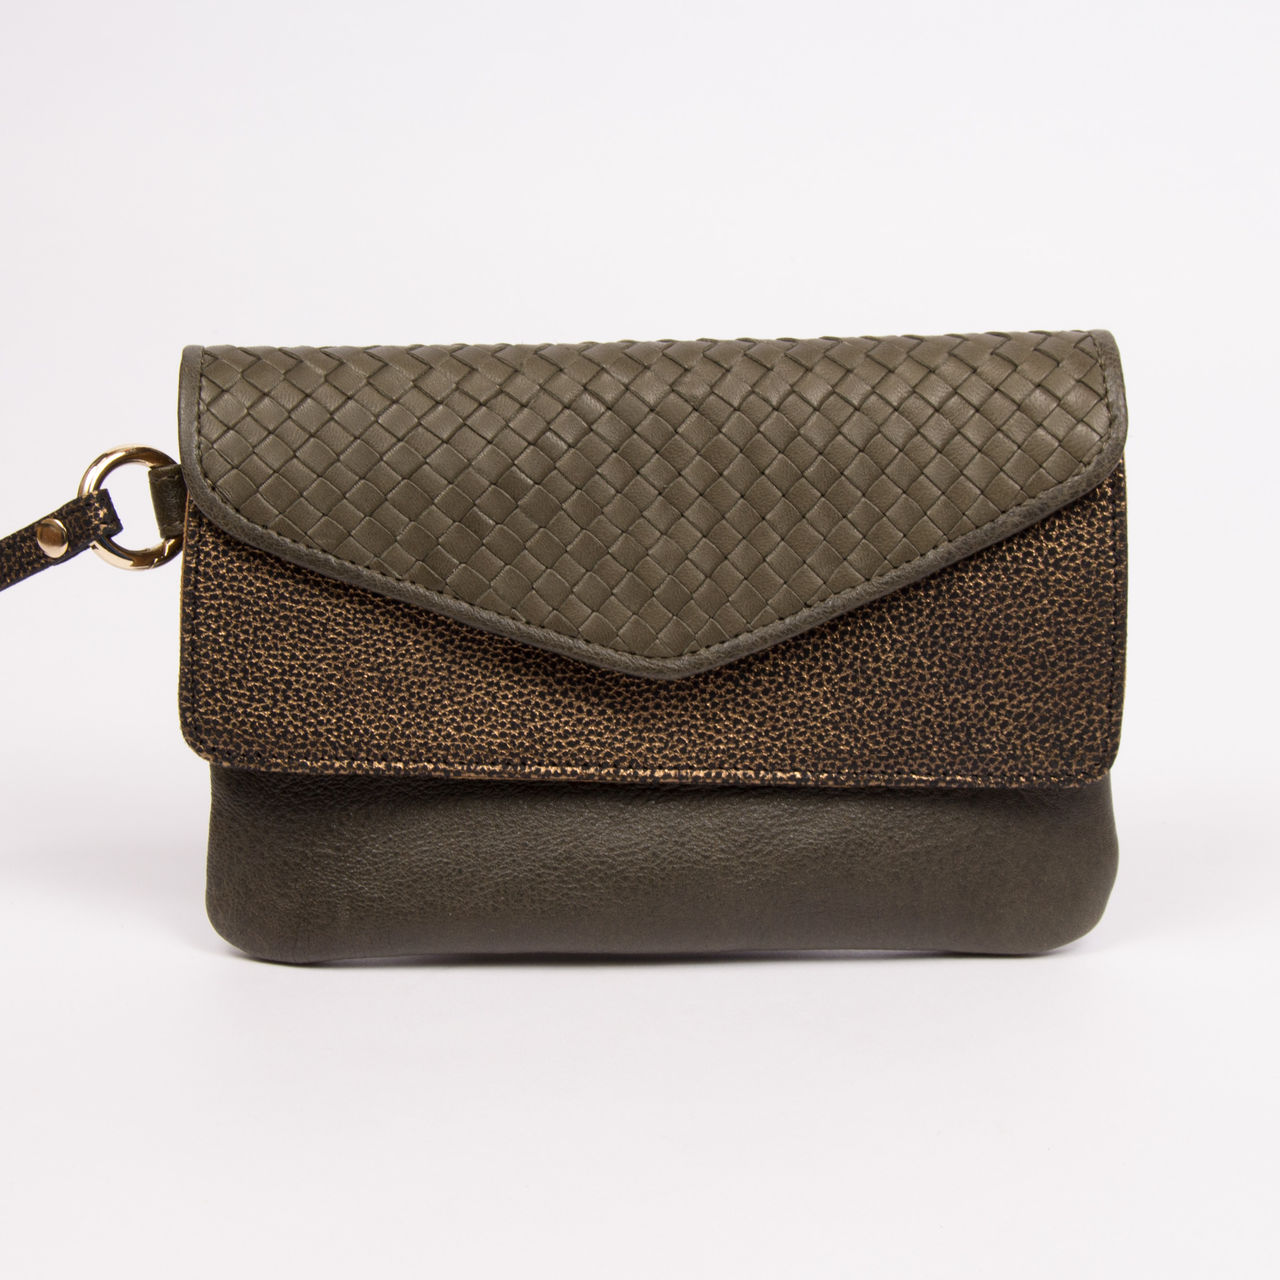 boutique la femme bagagerie petite maroquinerie pochette craie maxi pocket. Black Bedroom Furniture Sets. Home Design Ideas